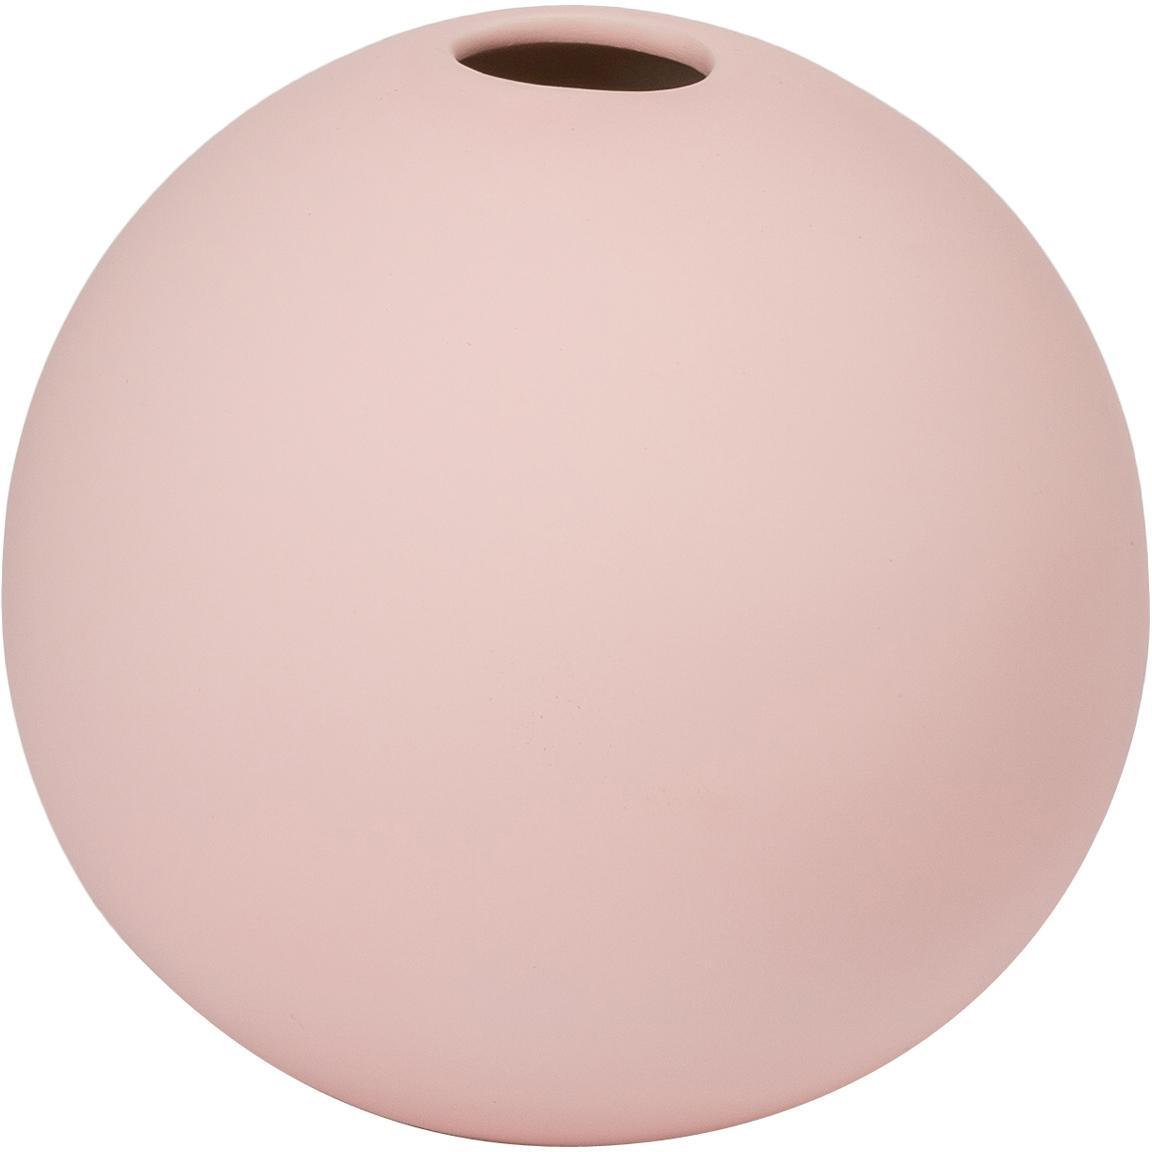 Vaso a sfera fatto a mano Ball, Ceramica, Rosa, Ø 8 x Alt. 8 cm